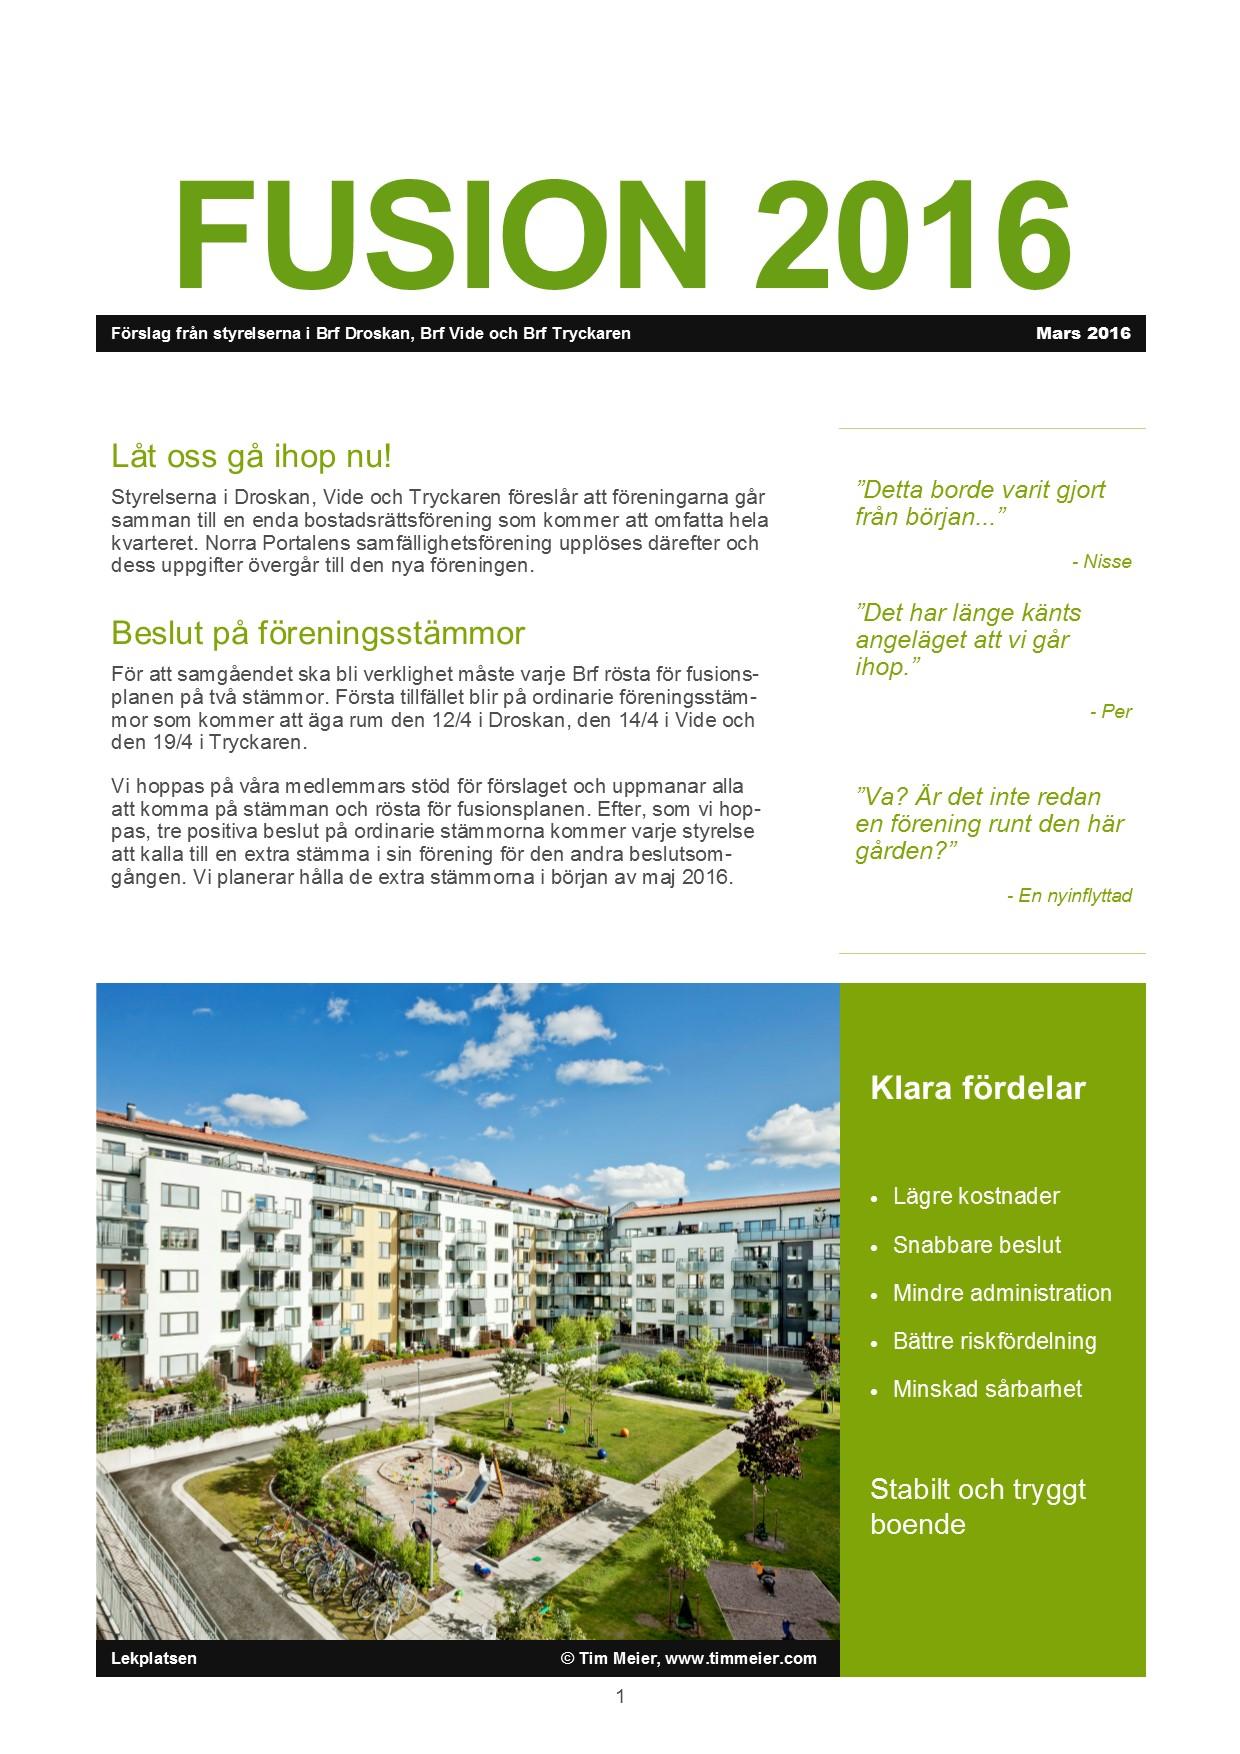 Fusionprospekt 2016